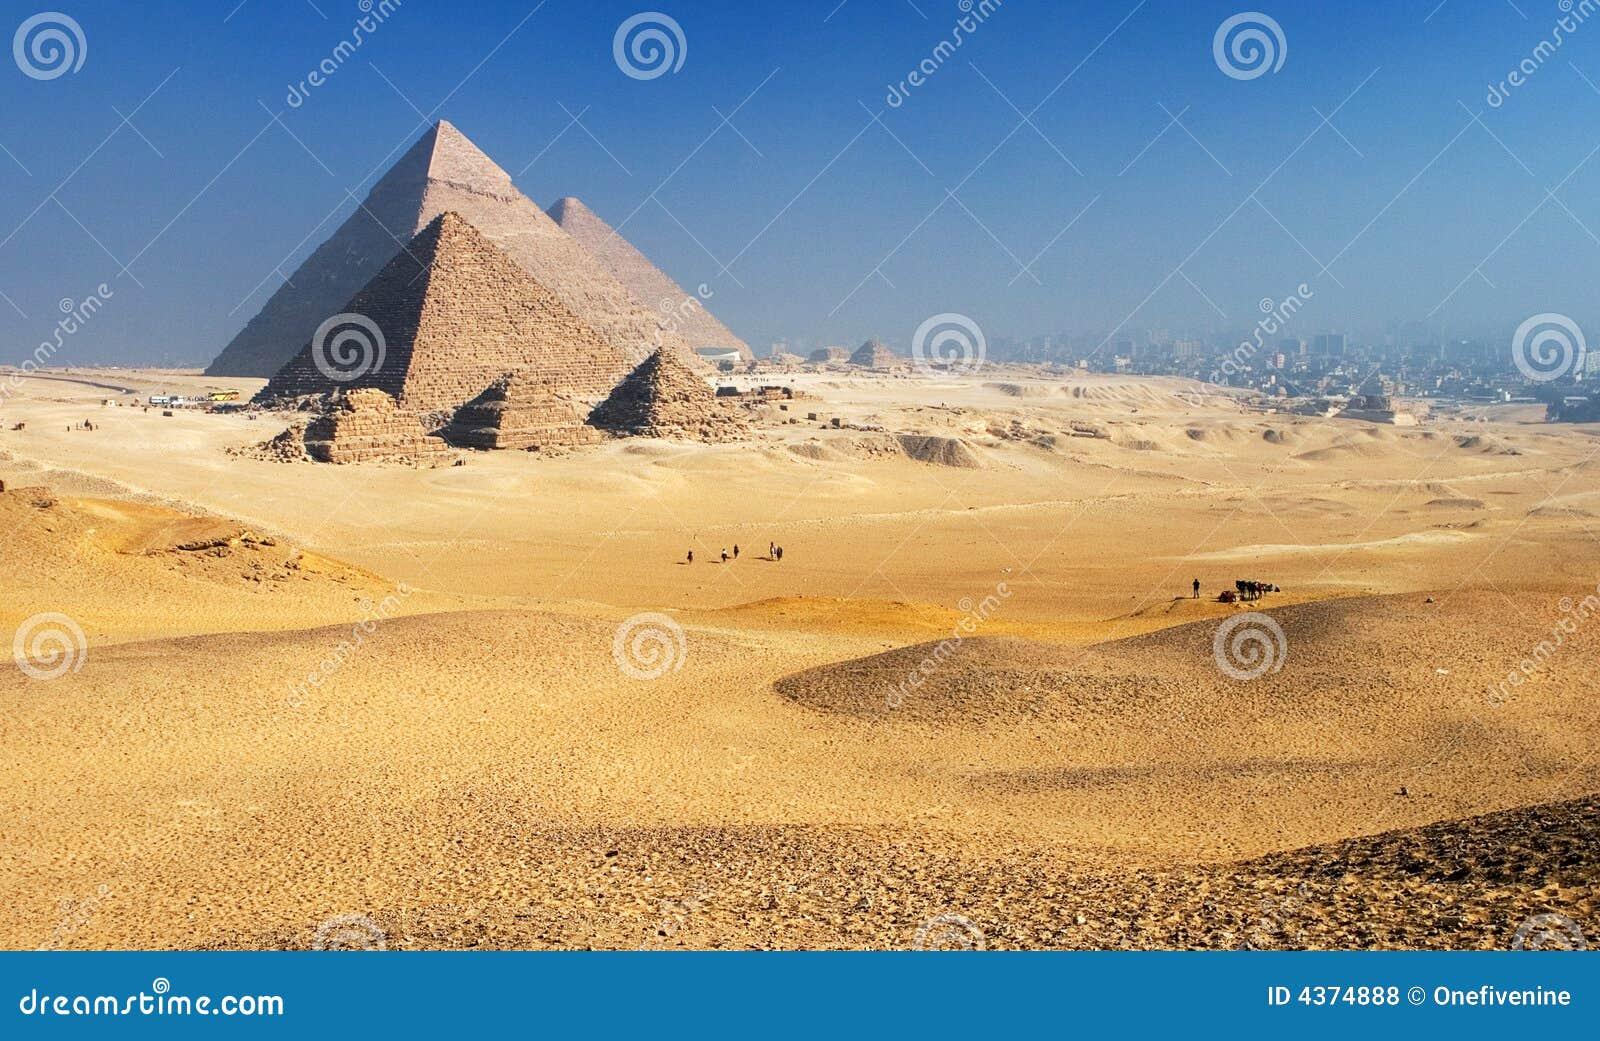 Cairo giza plateau pyramids